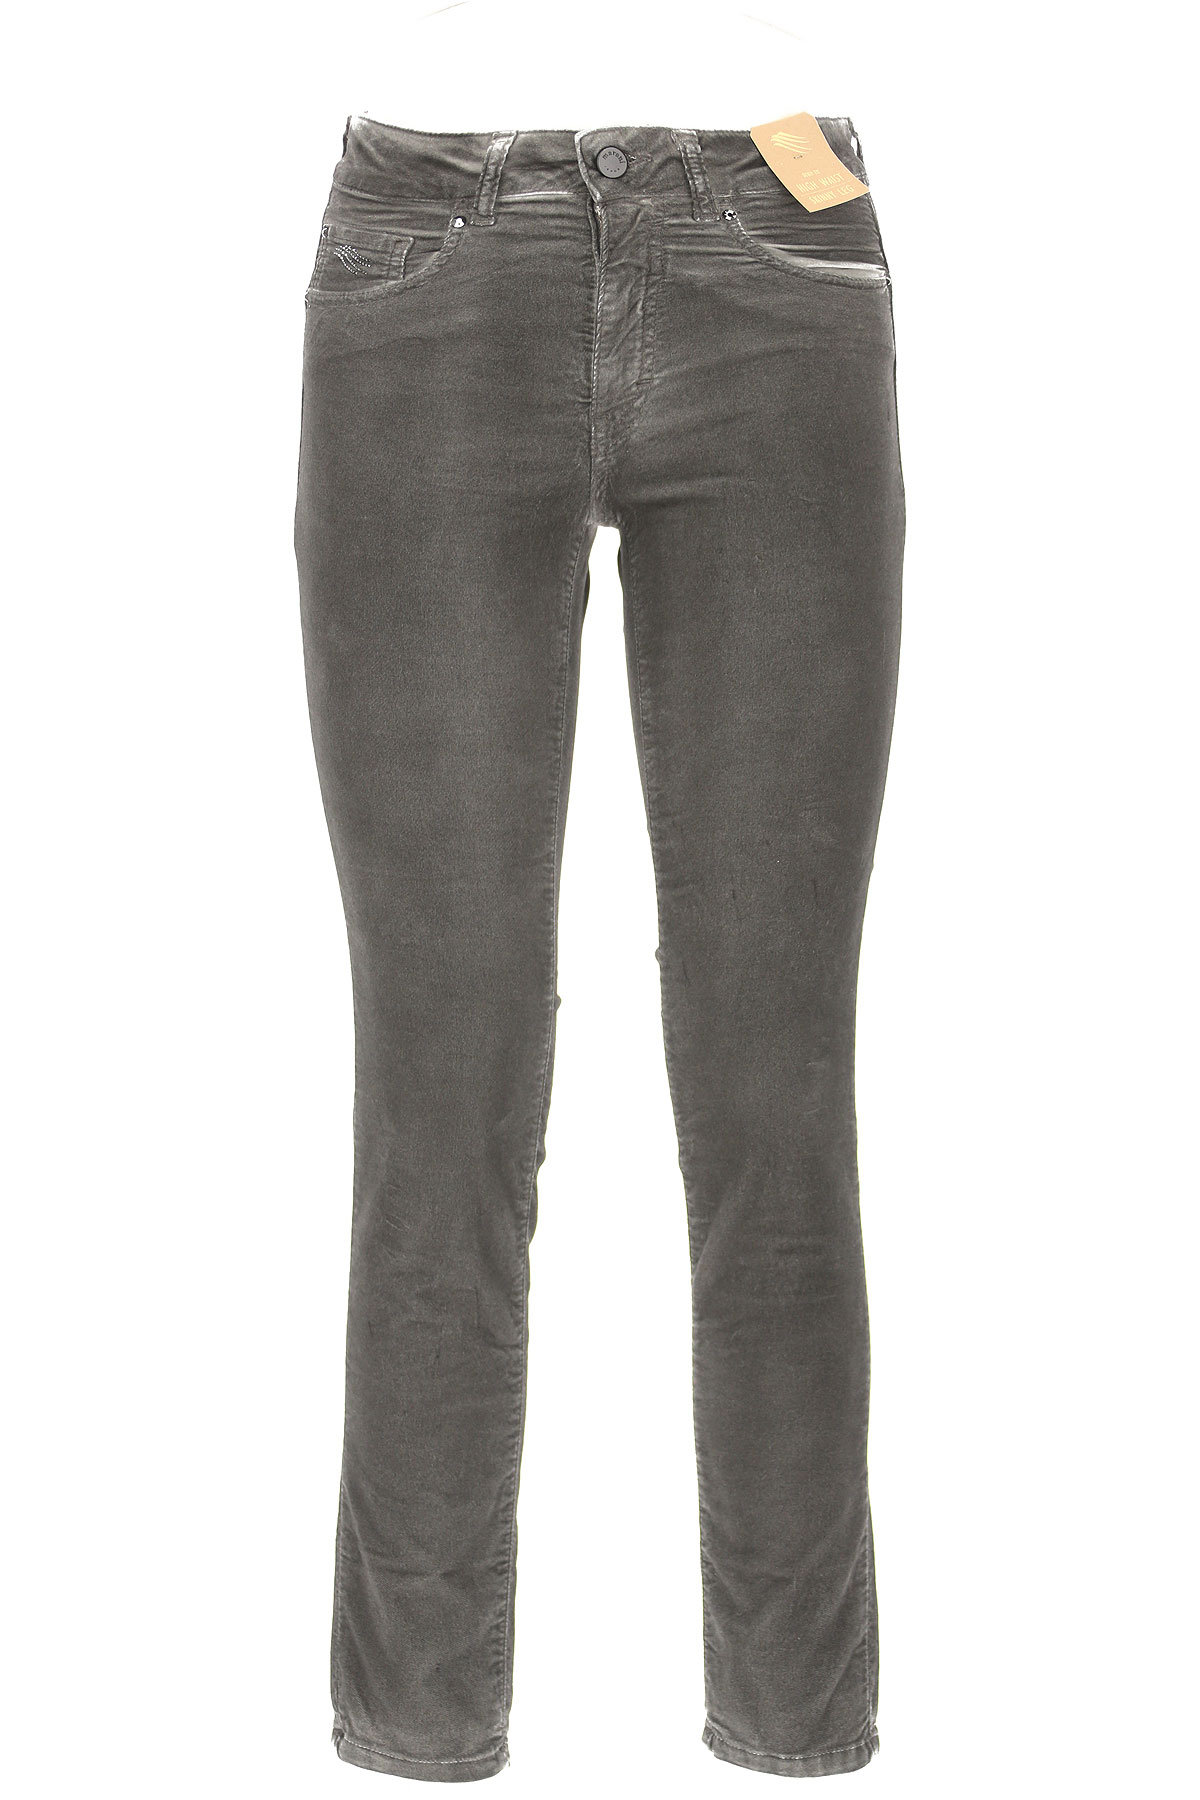 Image of Angelo Marani Jeans, Dark Grey, Cotton, 2017, 24 26 28 30 32